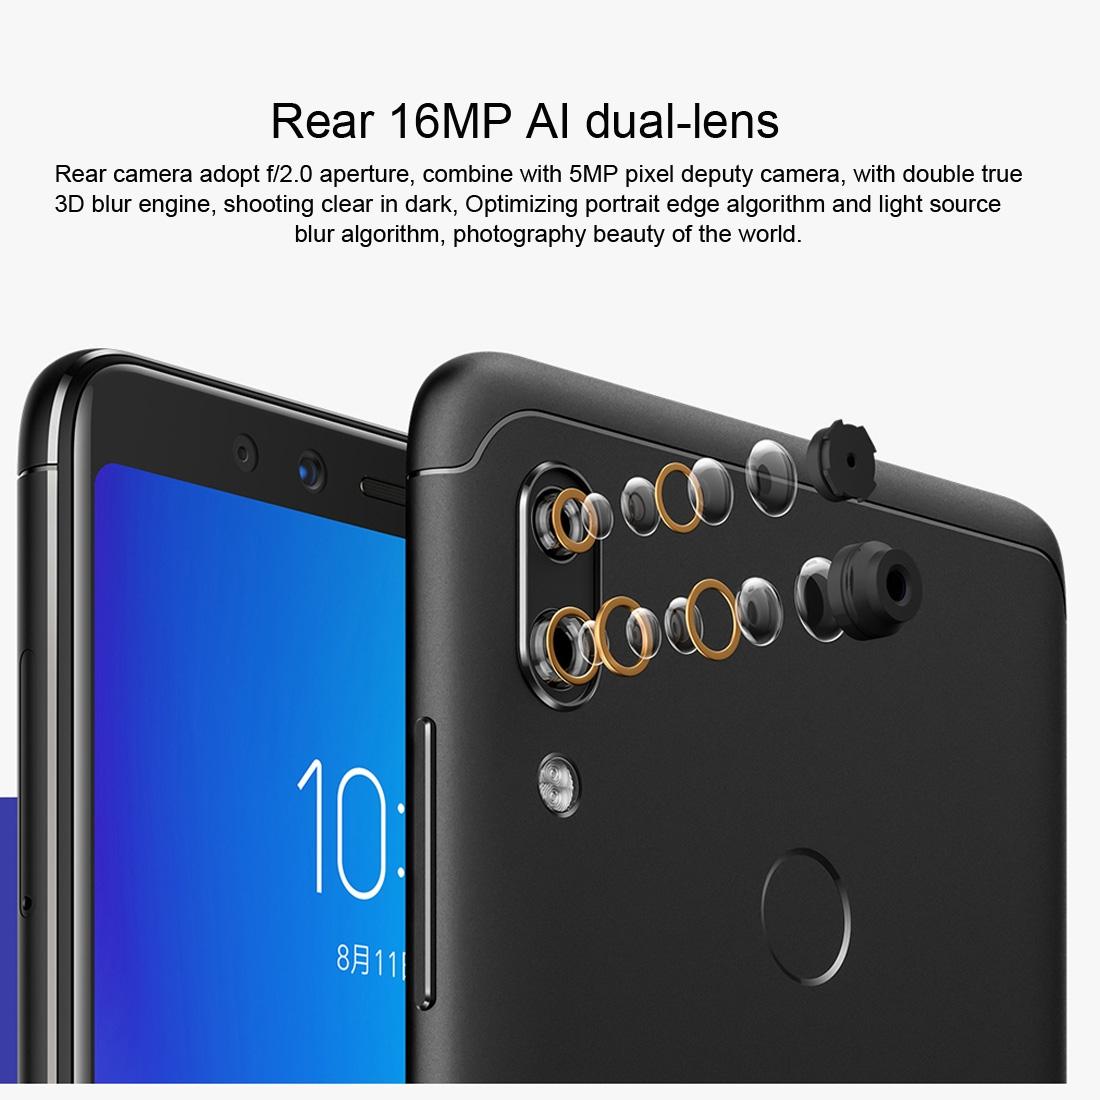 i.ibb.co/h2tD18C/Smartphone-6-GB-64-GB-Lenovo-K5-Pro-Preto-10.jpg